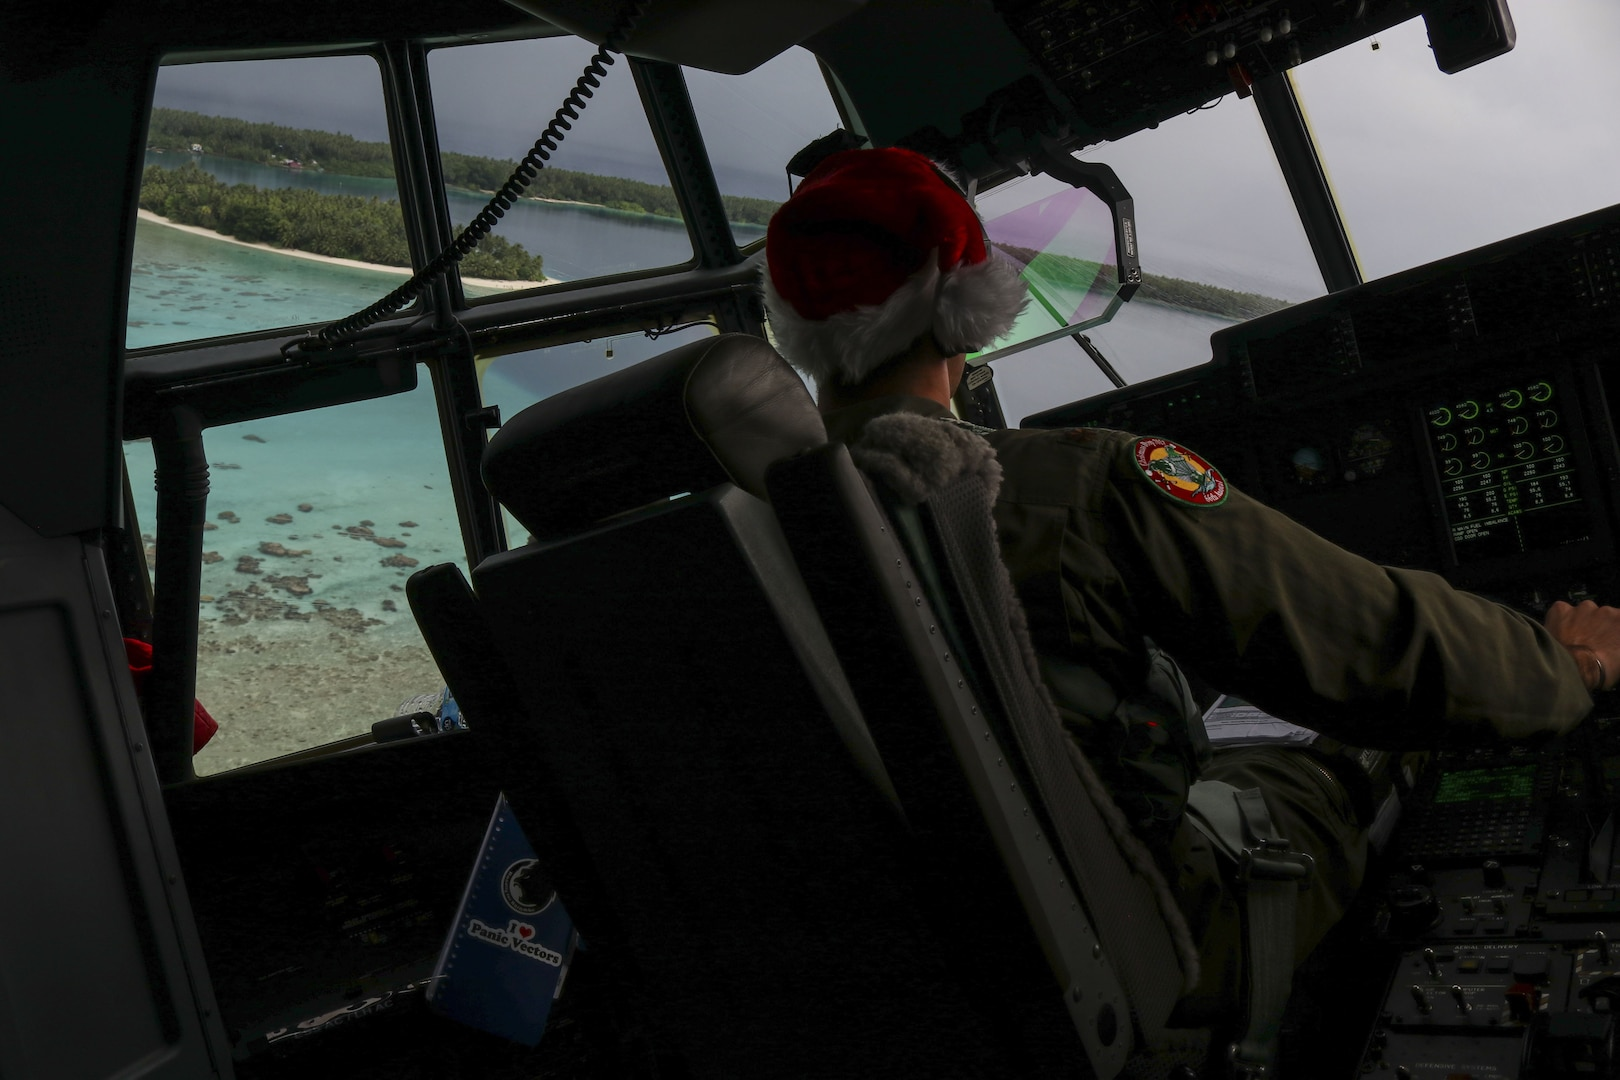 Santa's on his way: 66th Operation Christmas Drop